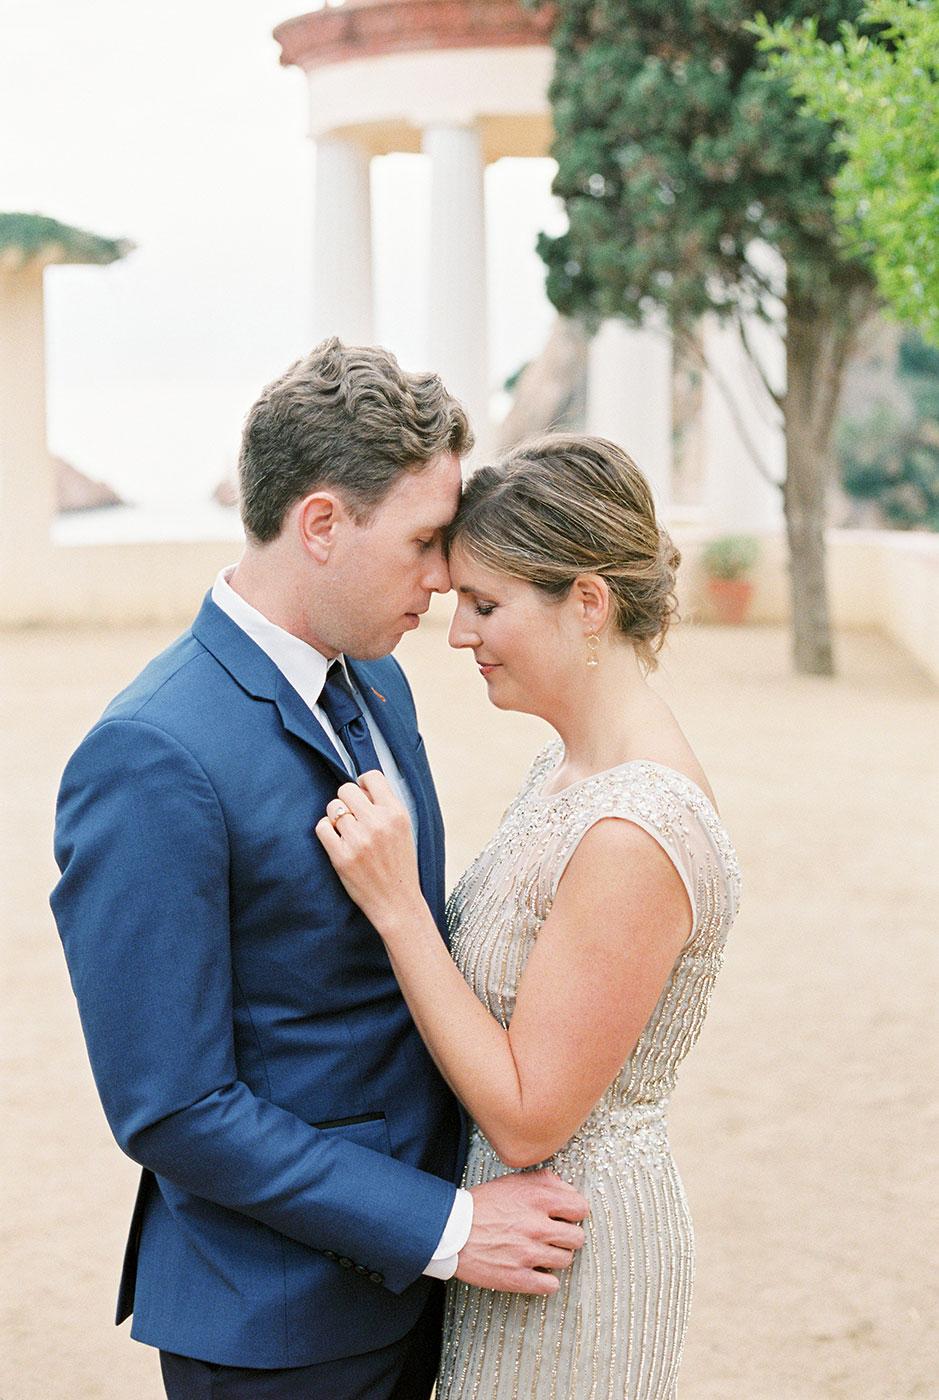 Barcelona Film Photographer | Barcelona Wedding Photographer | Lena Karelova Photography